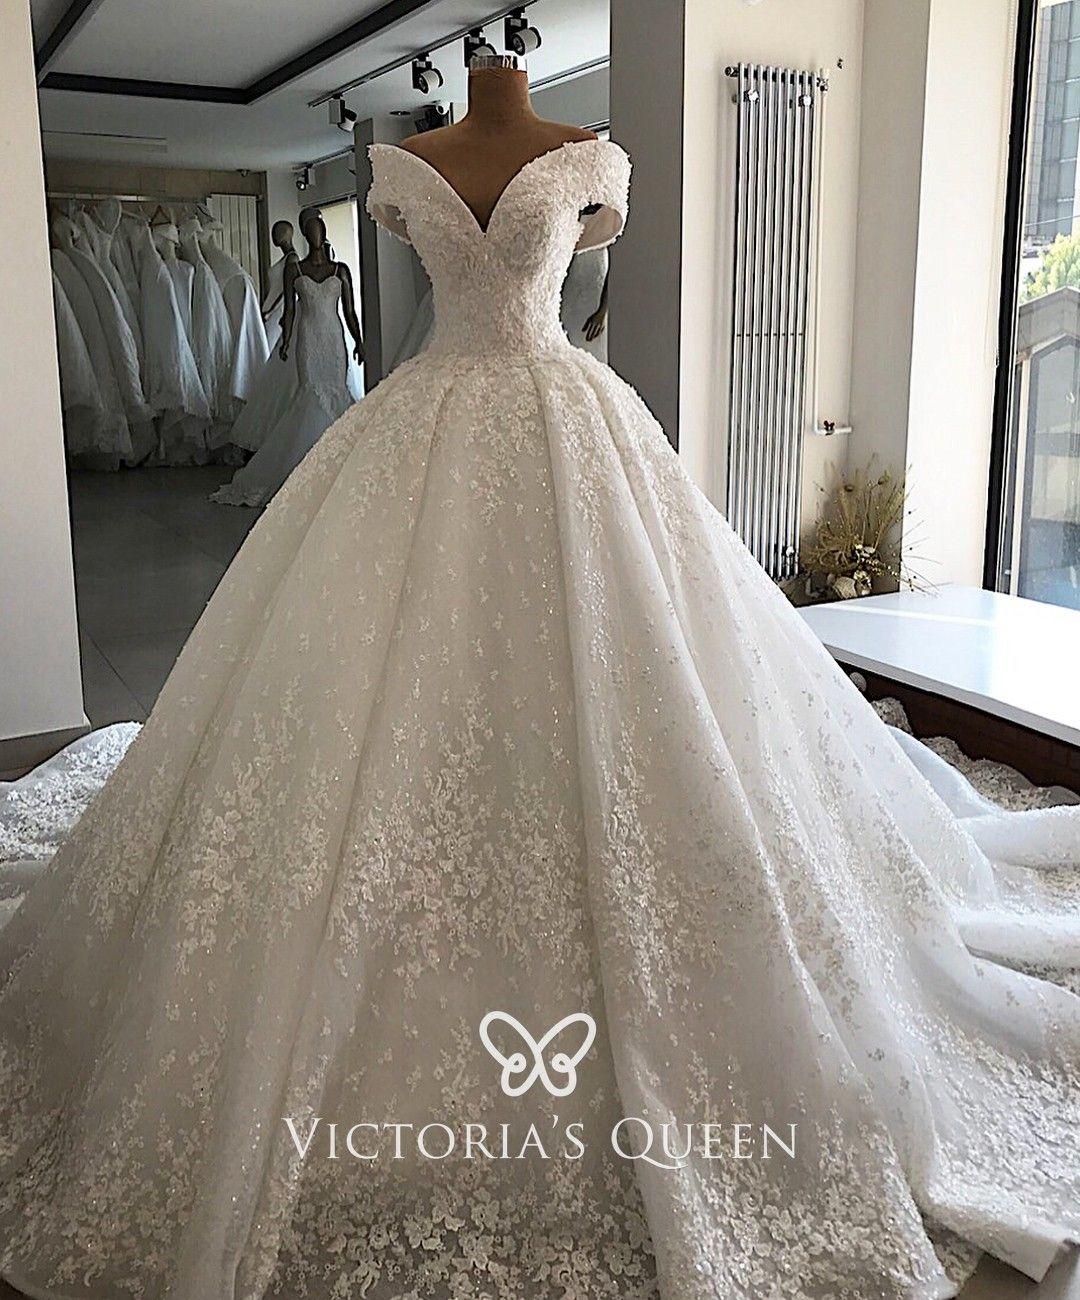 Luxury Beaded Off Shoulder Princess Wedding Ball Gown In 2021 Elegant Ball Gowns Wedding Dresses Applique Wedding Dress [ 1300 x 1080 Pixel ]